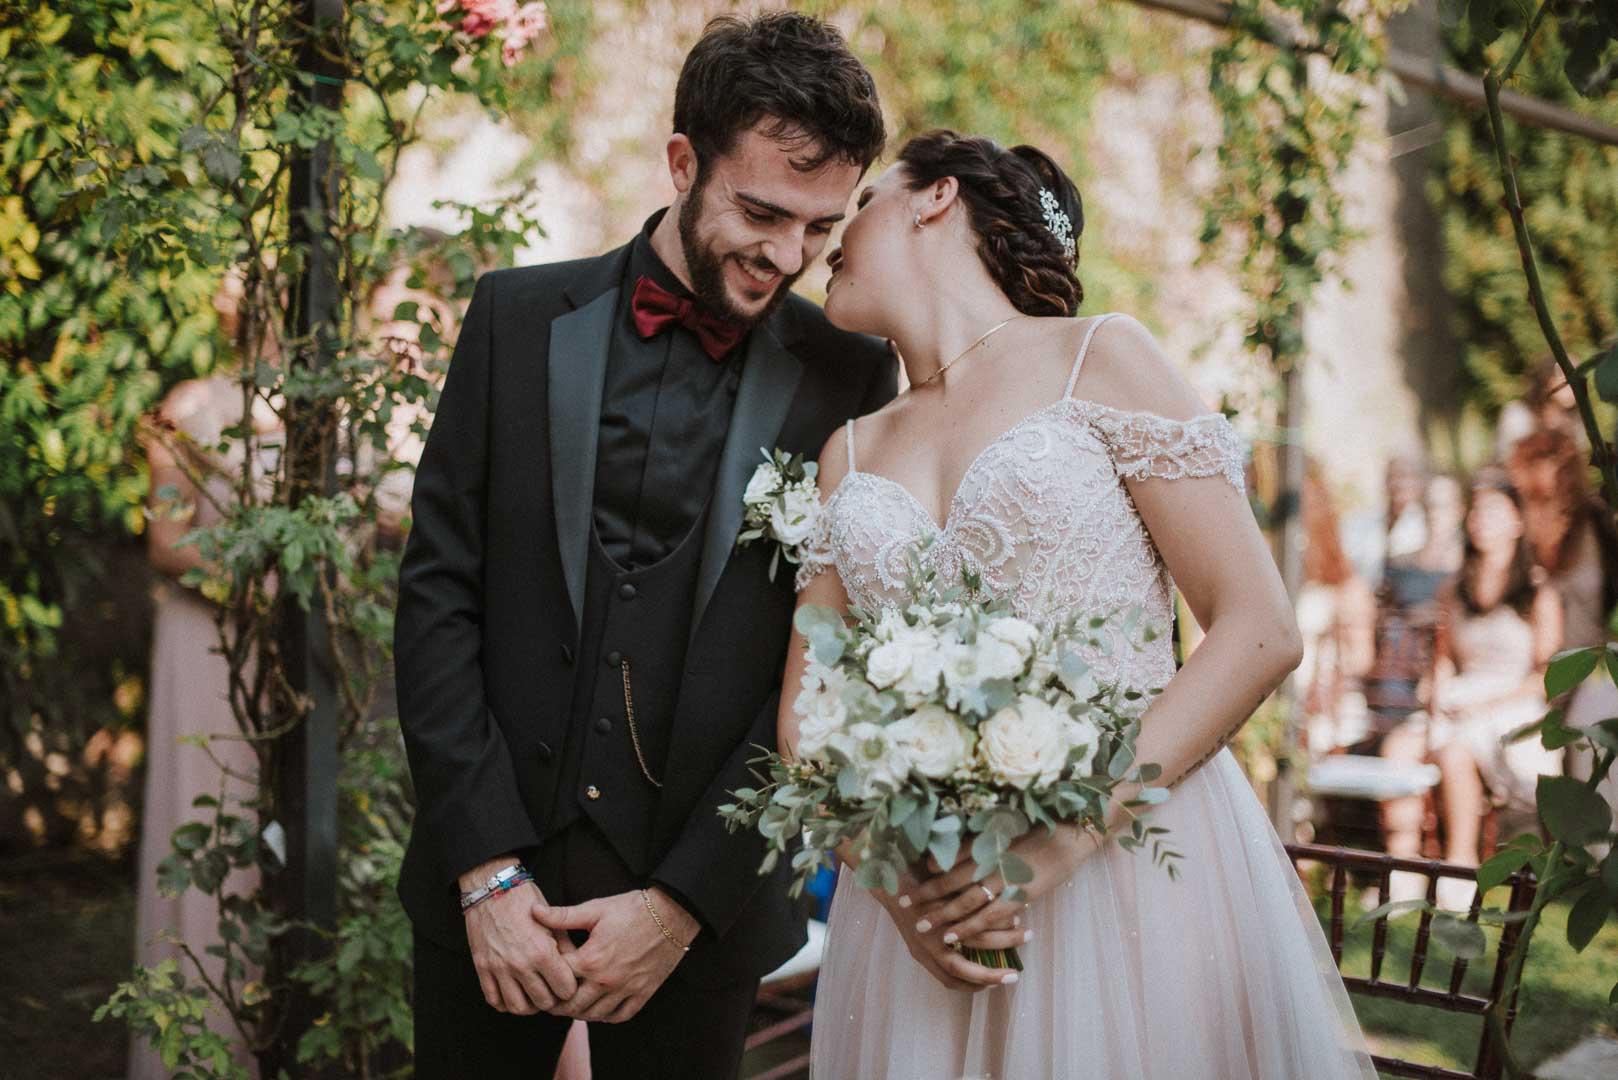 wedding-photographer-destination-fineart-bespoke-reportage-tuscany-villascorzi-vivianeizzo-spazio46-65